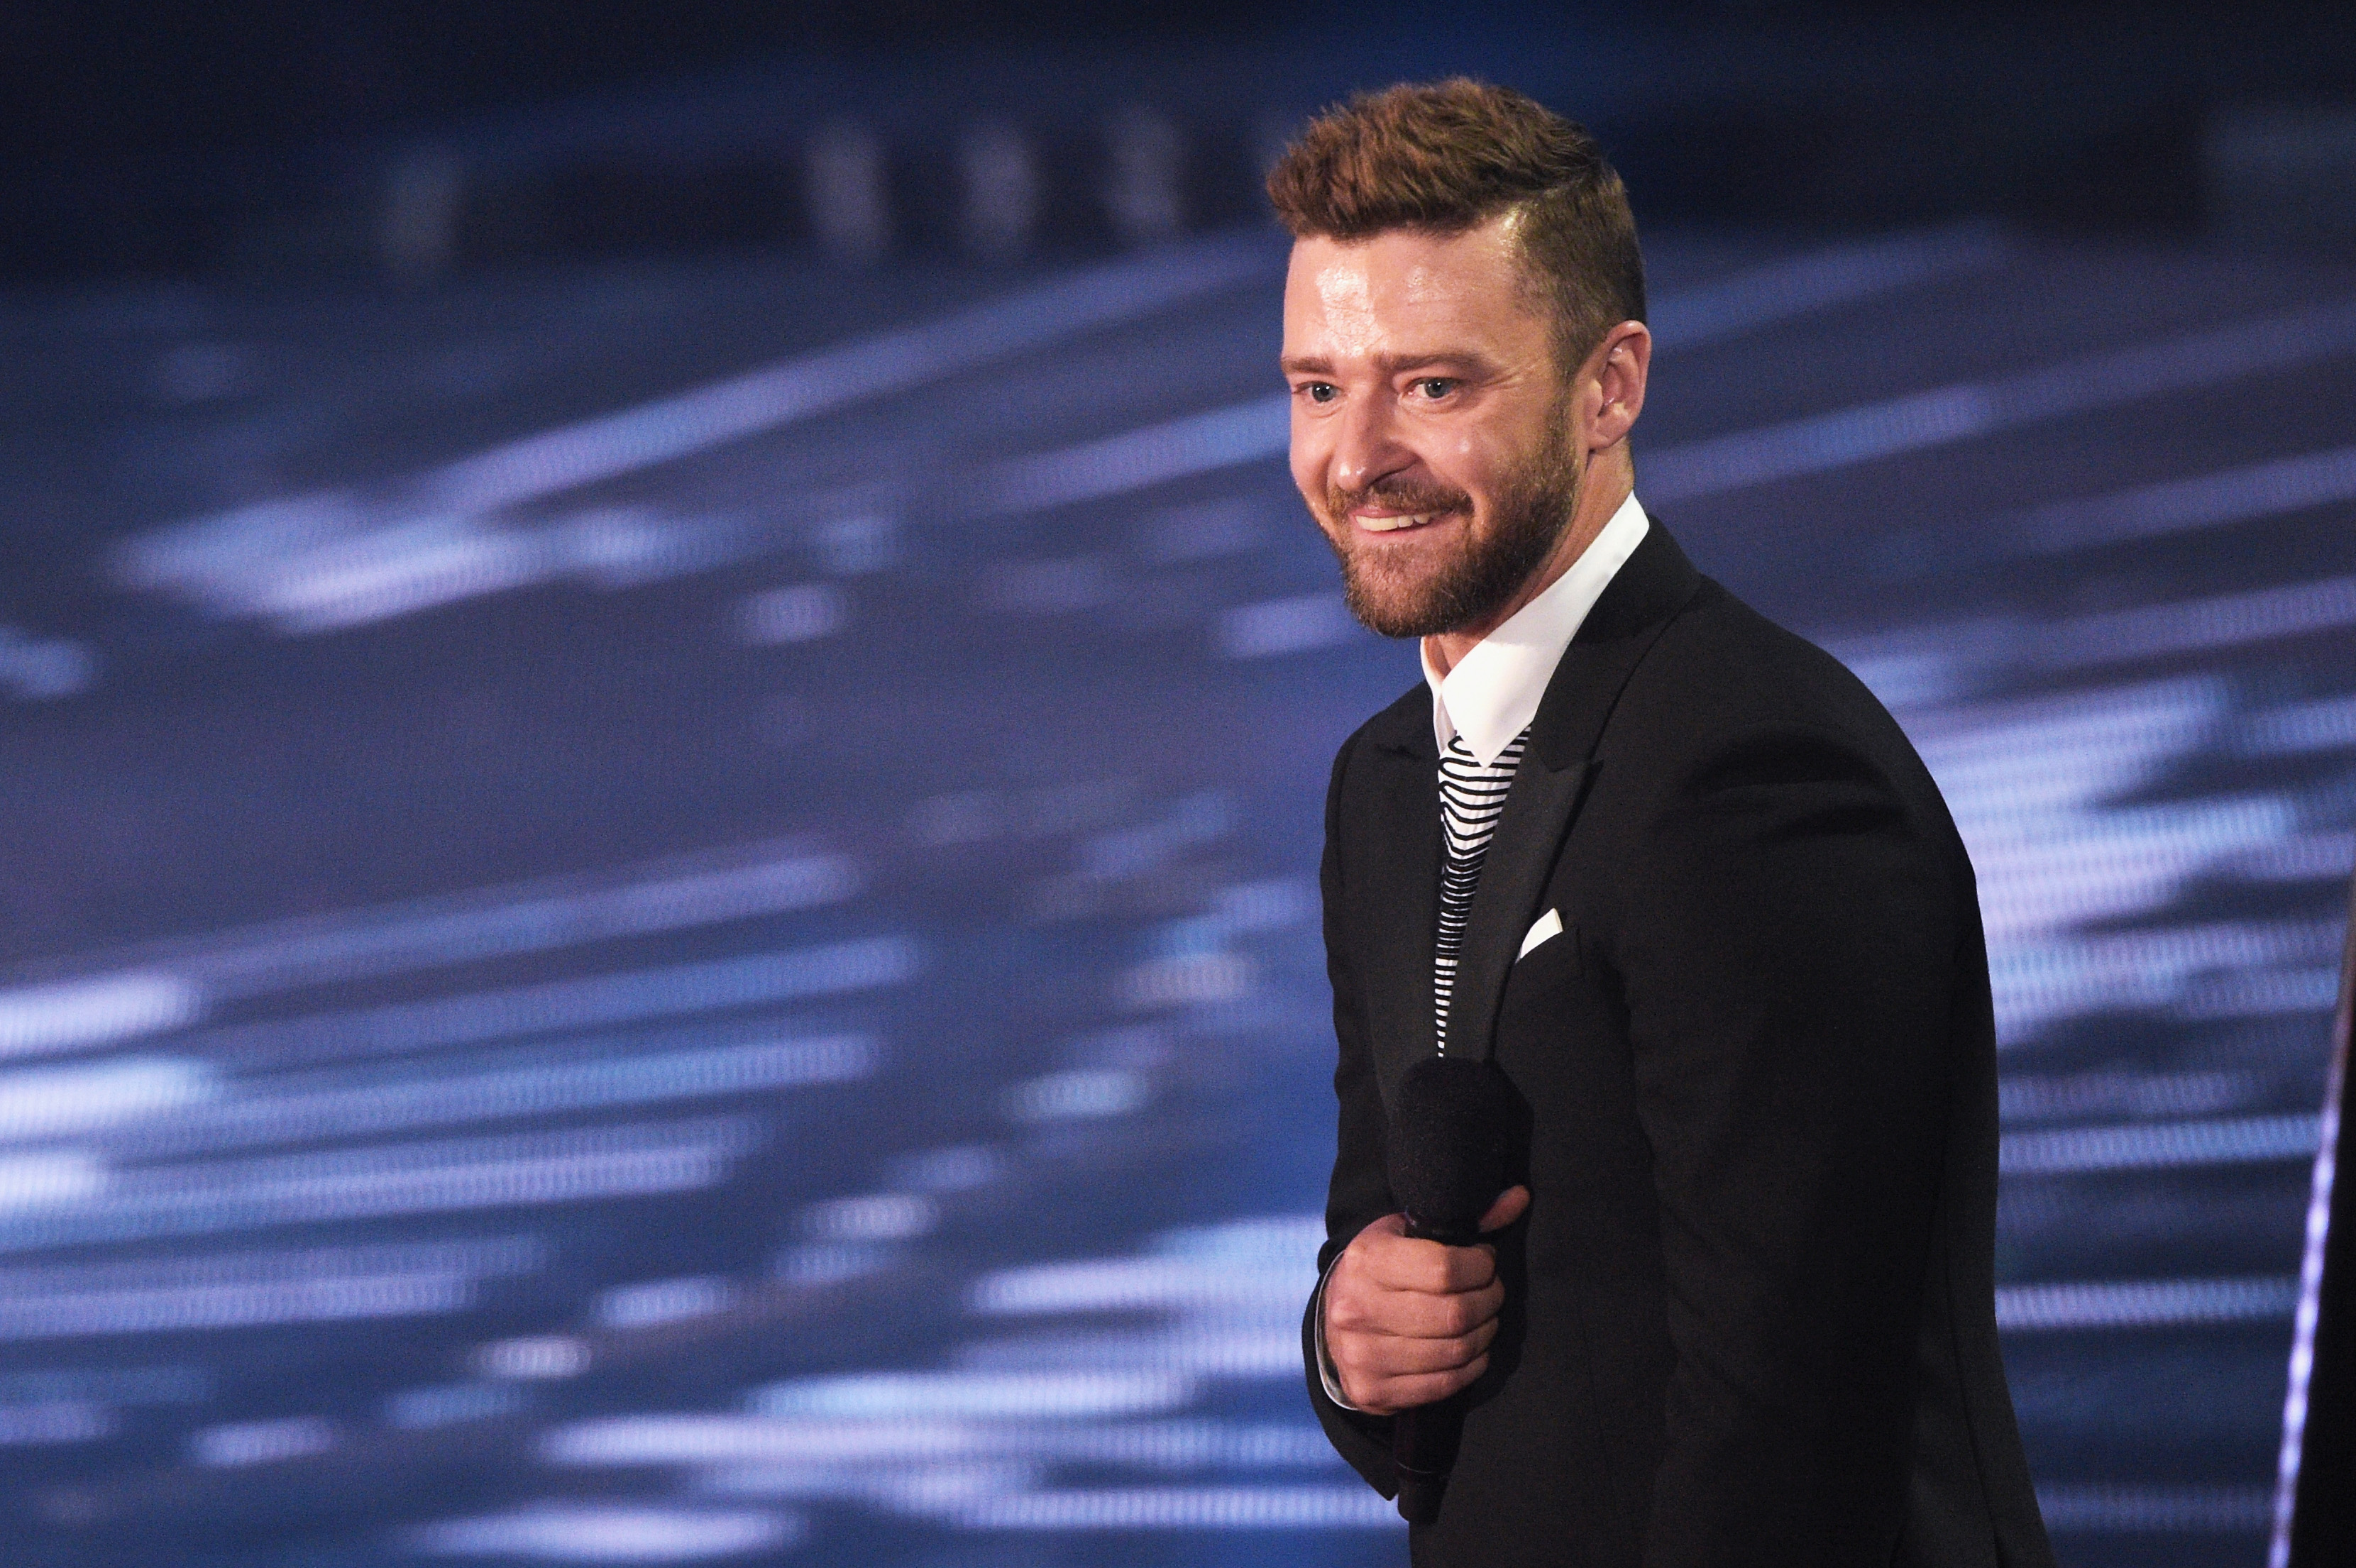 Justin Timberlake 06.05.2016ANDREW